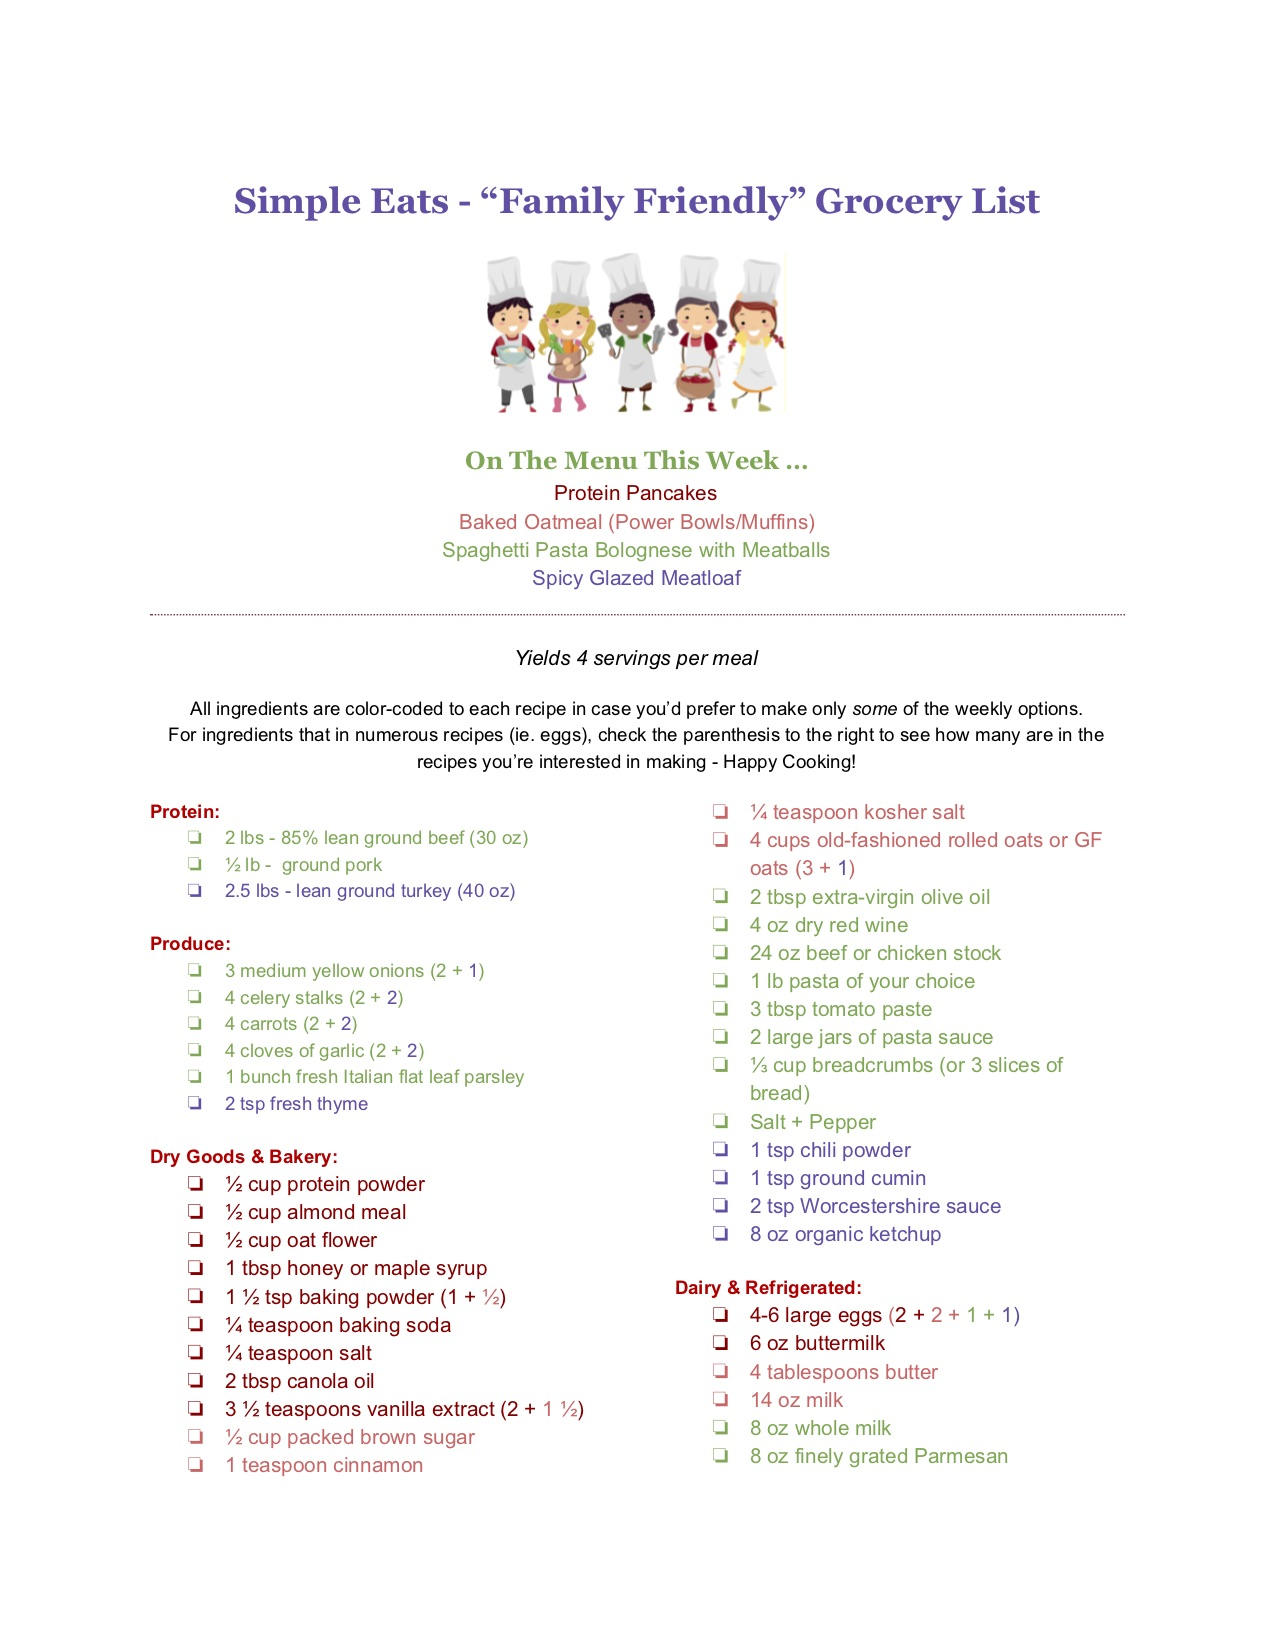 Family Friendly Grocery List.jpg